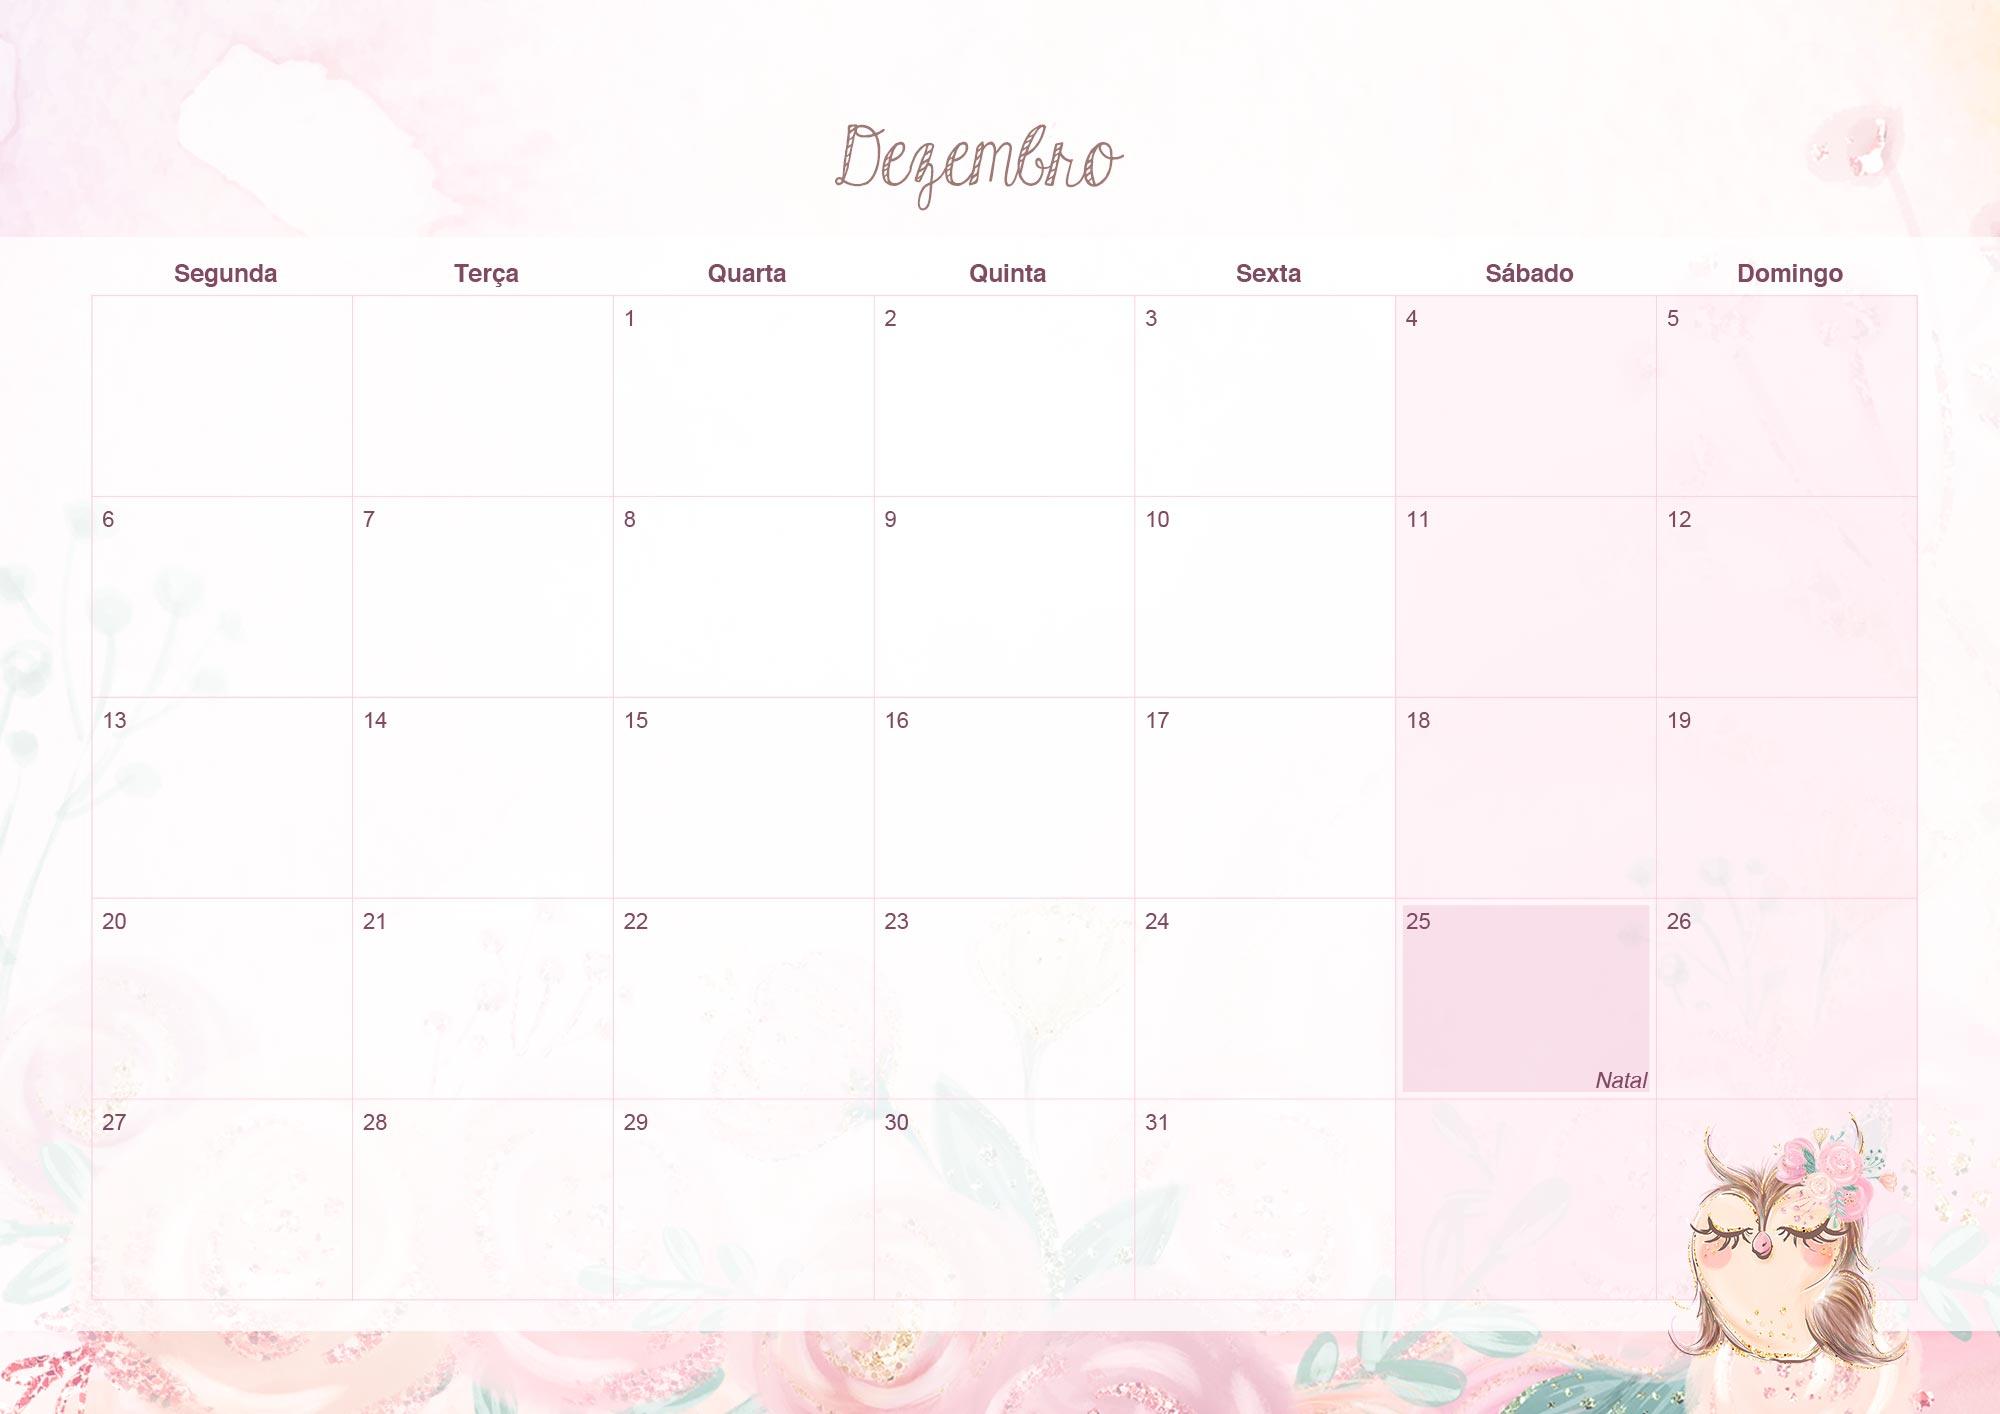 Calendario Mensal 2021 para Imprimir Corujinha dezembro